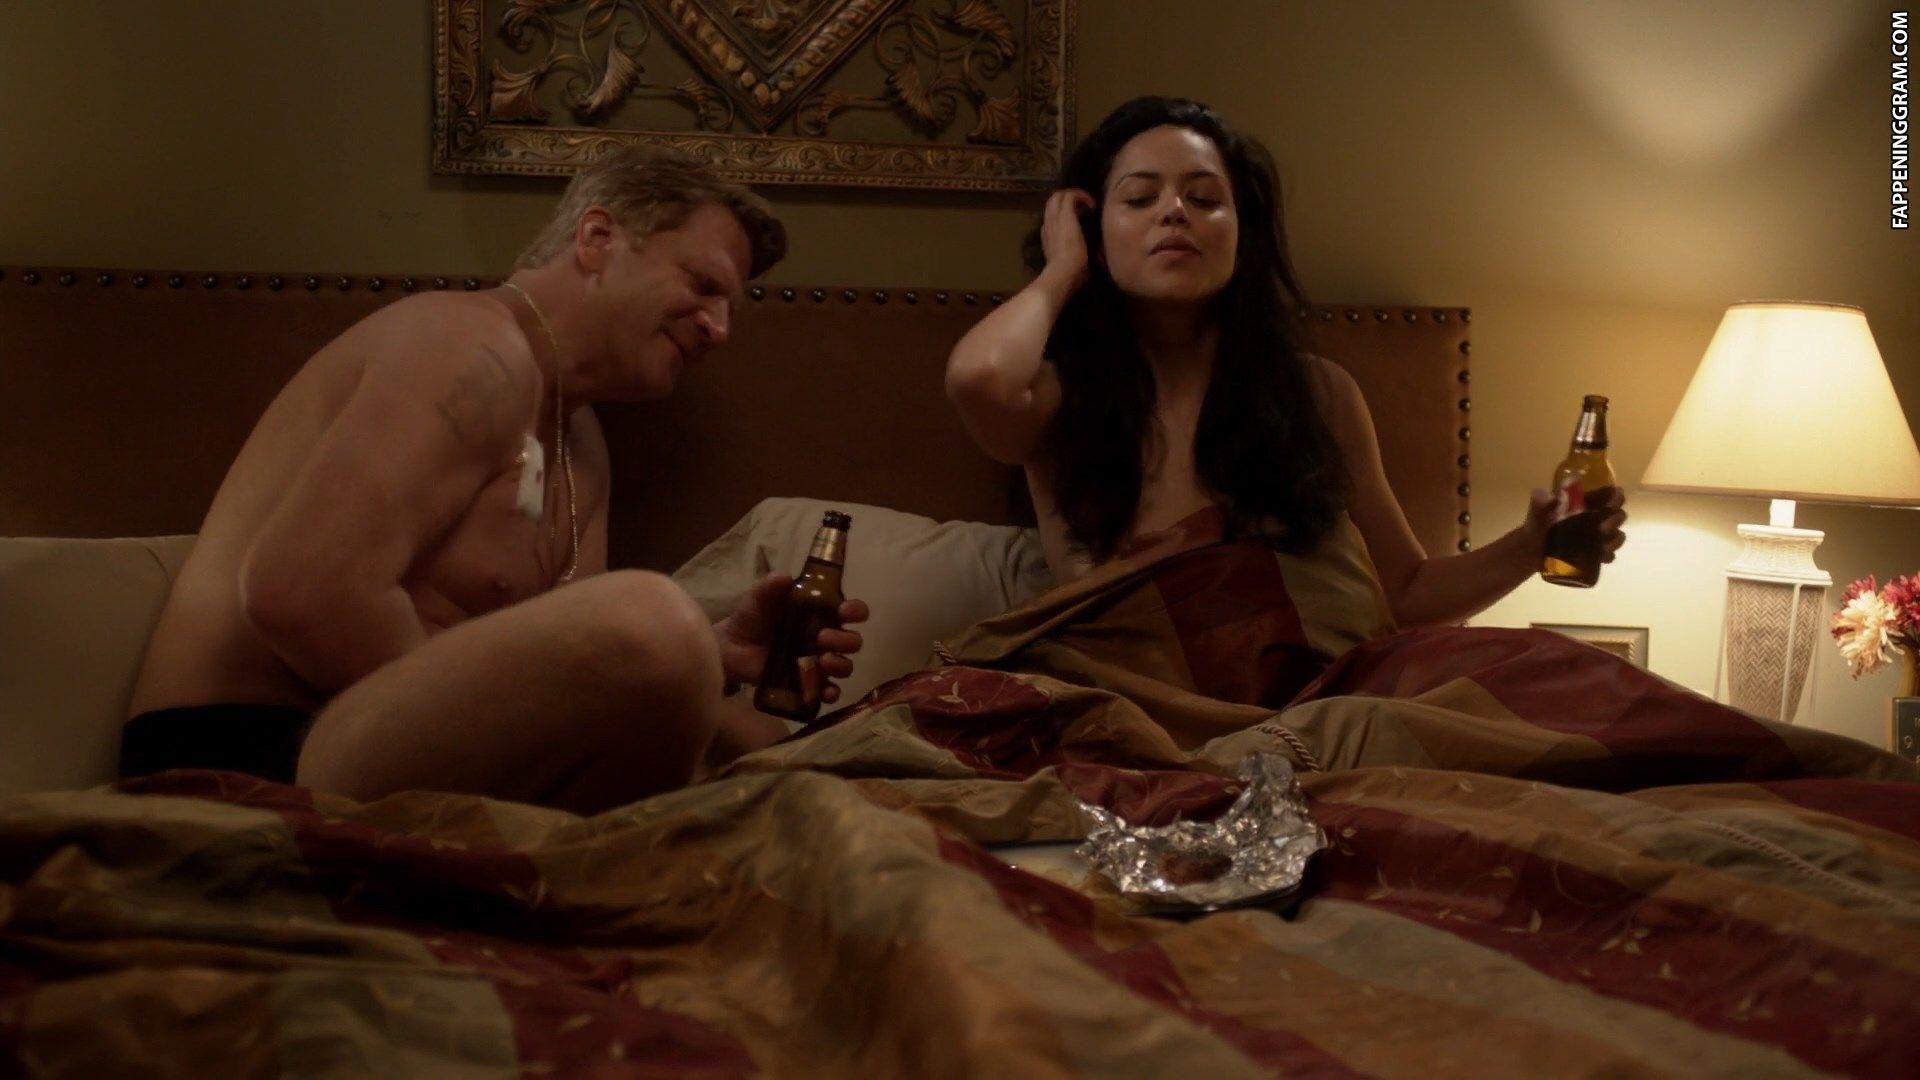 Alyssa diaz nude leaked photos nude celebrity photos